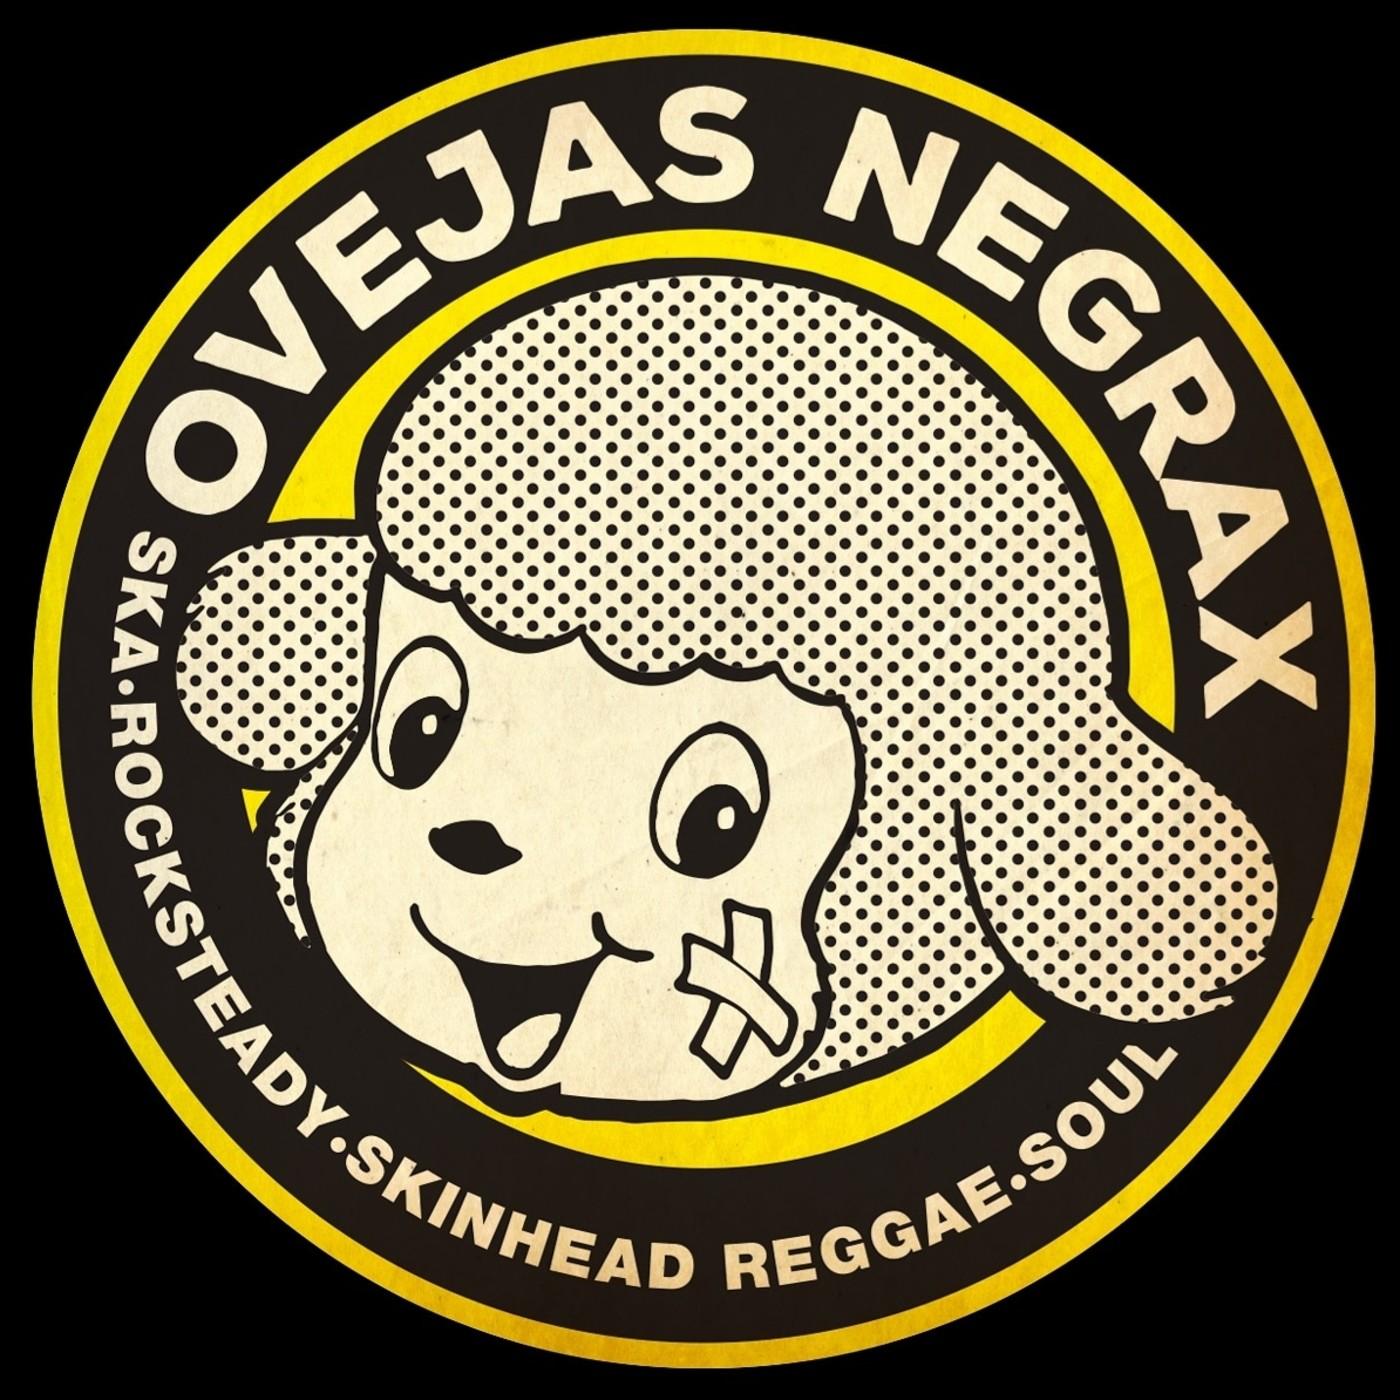 Ovejas Negrax/ Niko Henry & Reggae Fever Society Chile /#113